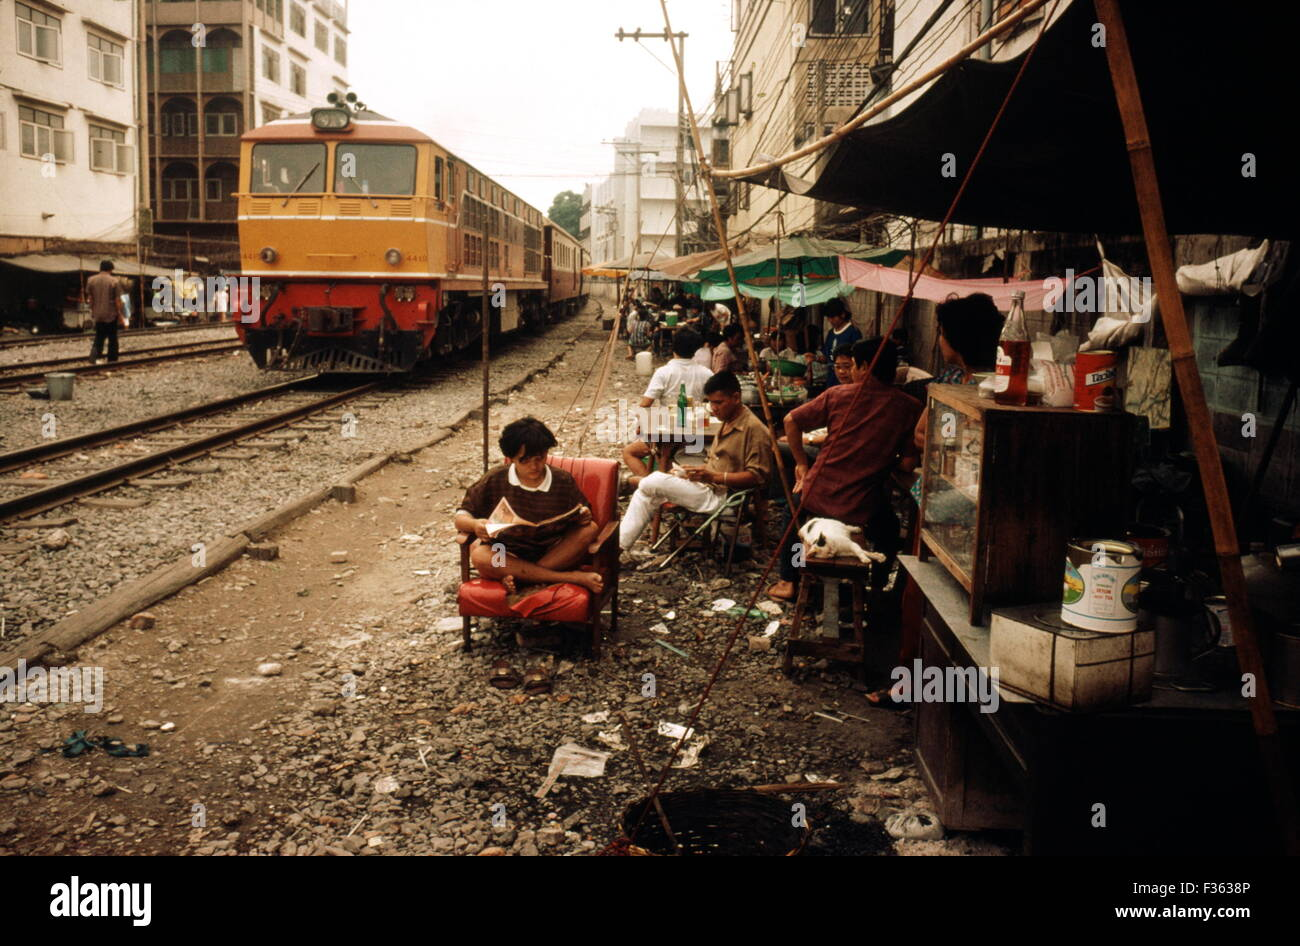 AJAXNETPHOTO - 1987. BANGKOK, THAILAND - RAILWAYS - TRACKSIDE LIFE IN THE CITY. PHOTO:JONATHAN EASTLAND/AJAX REF:BKK Stock Photo